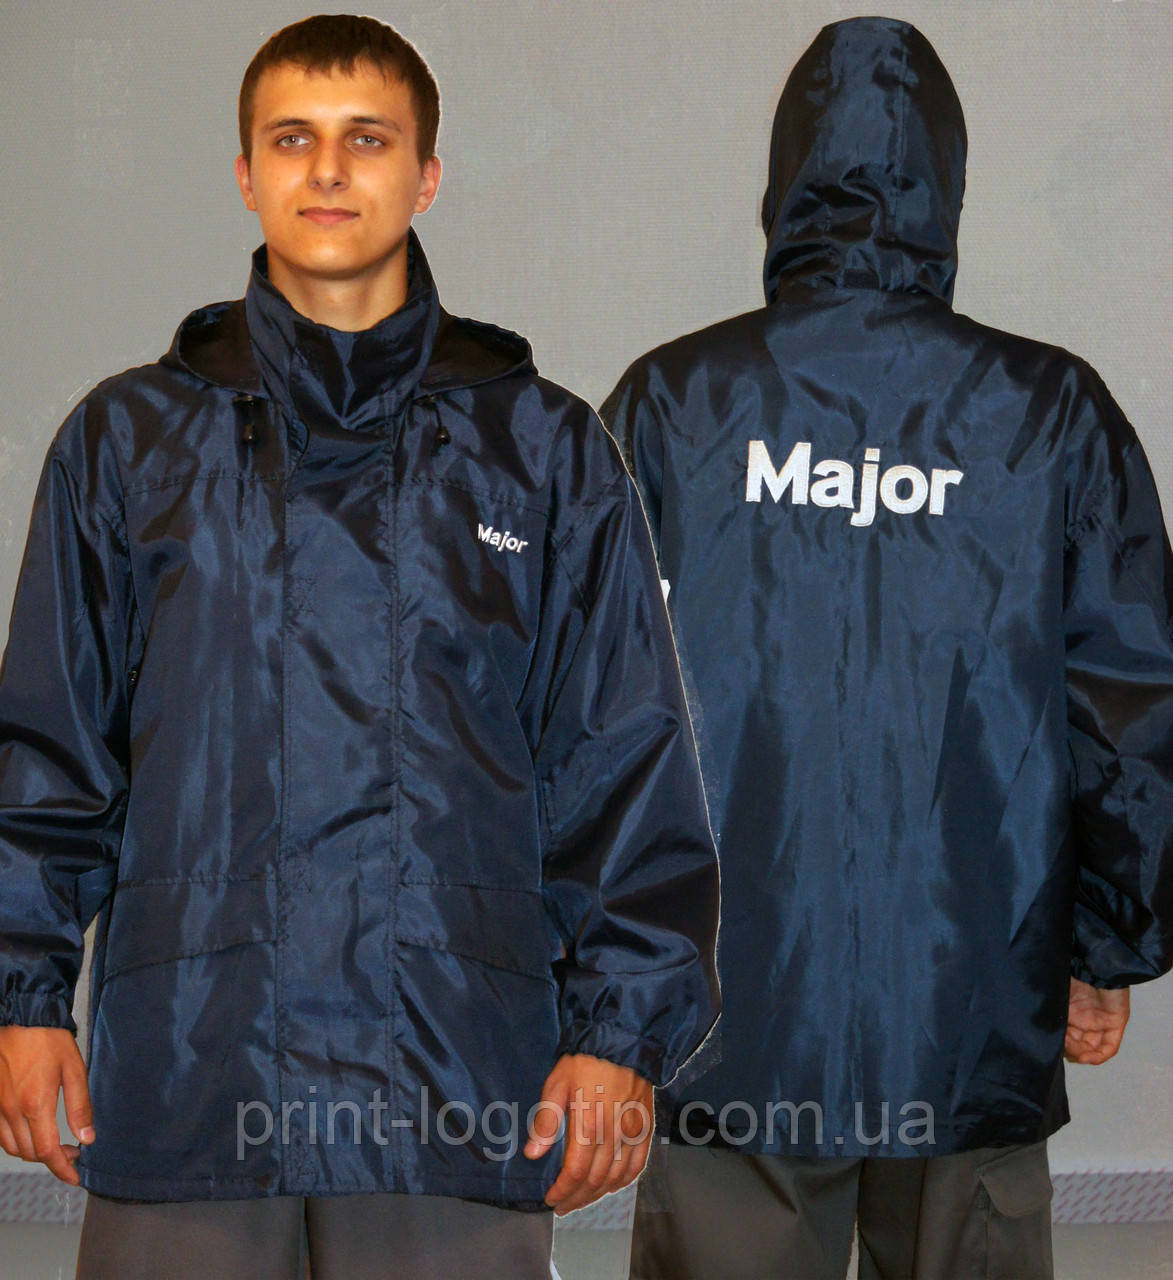 Куртки и ветрловки с логотипом